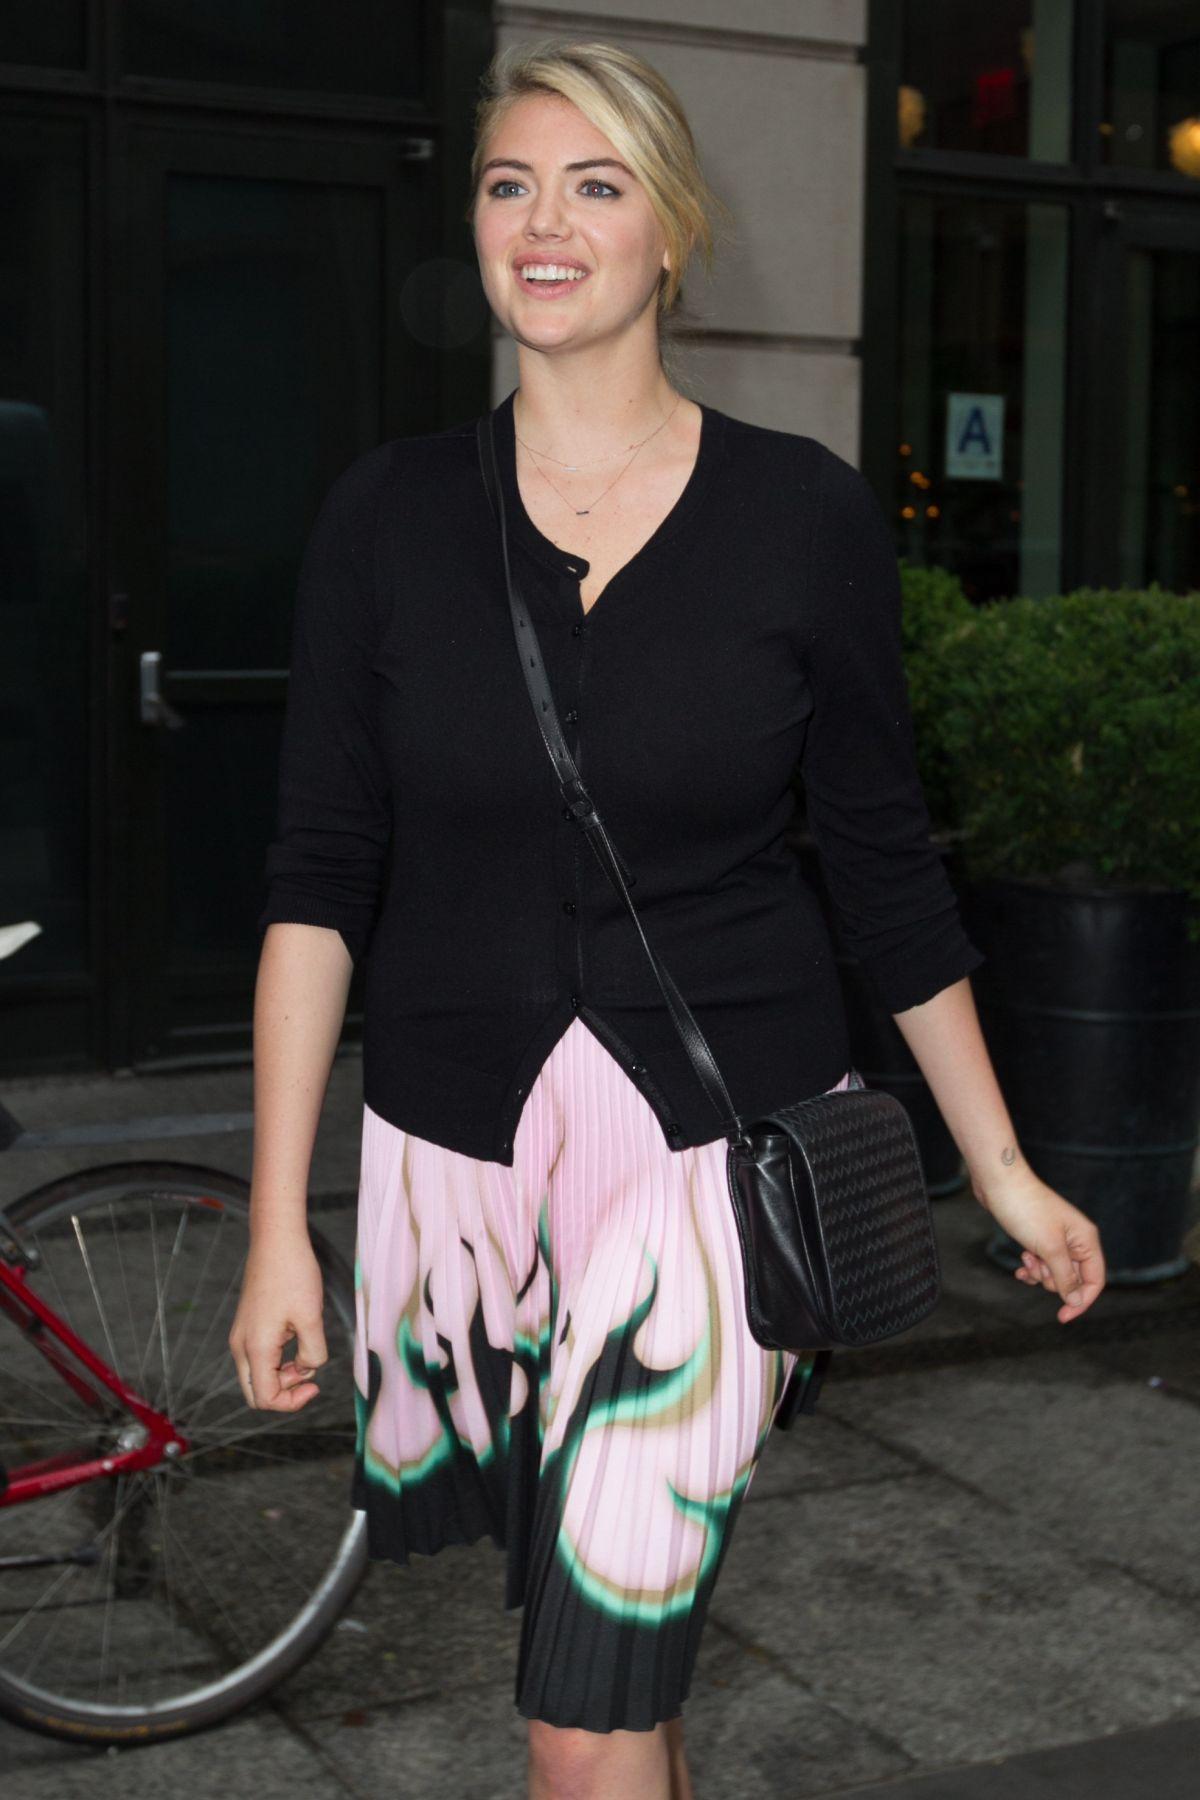 KATE UPTON Leaves Crosby Street Hotel in New York 06/01/2015